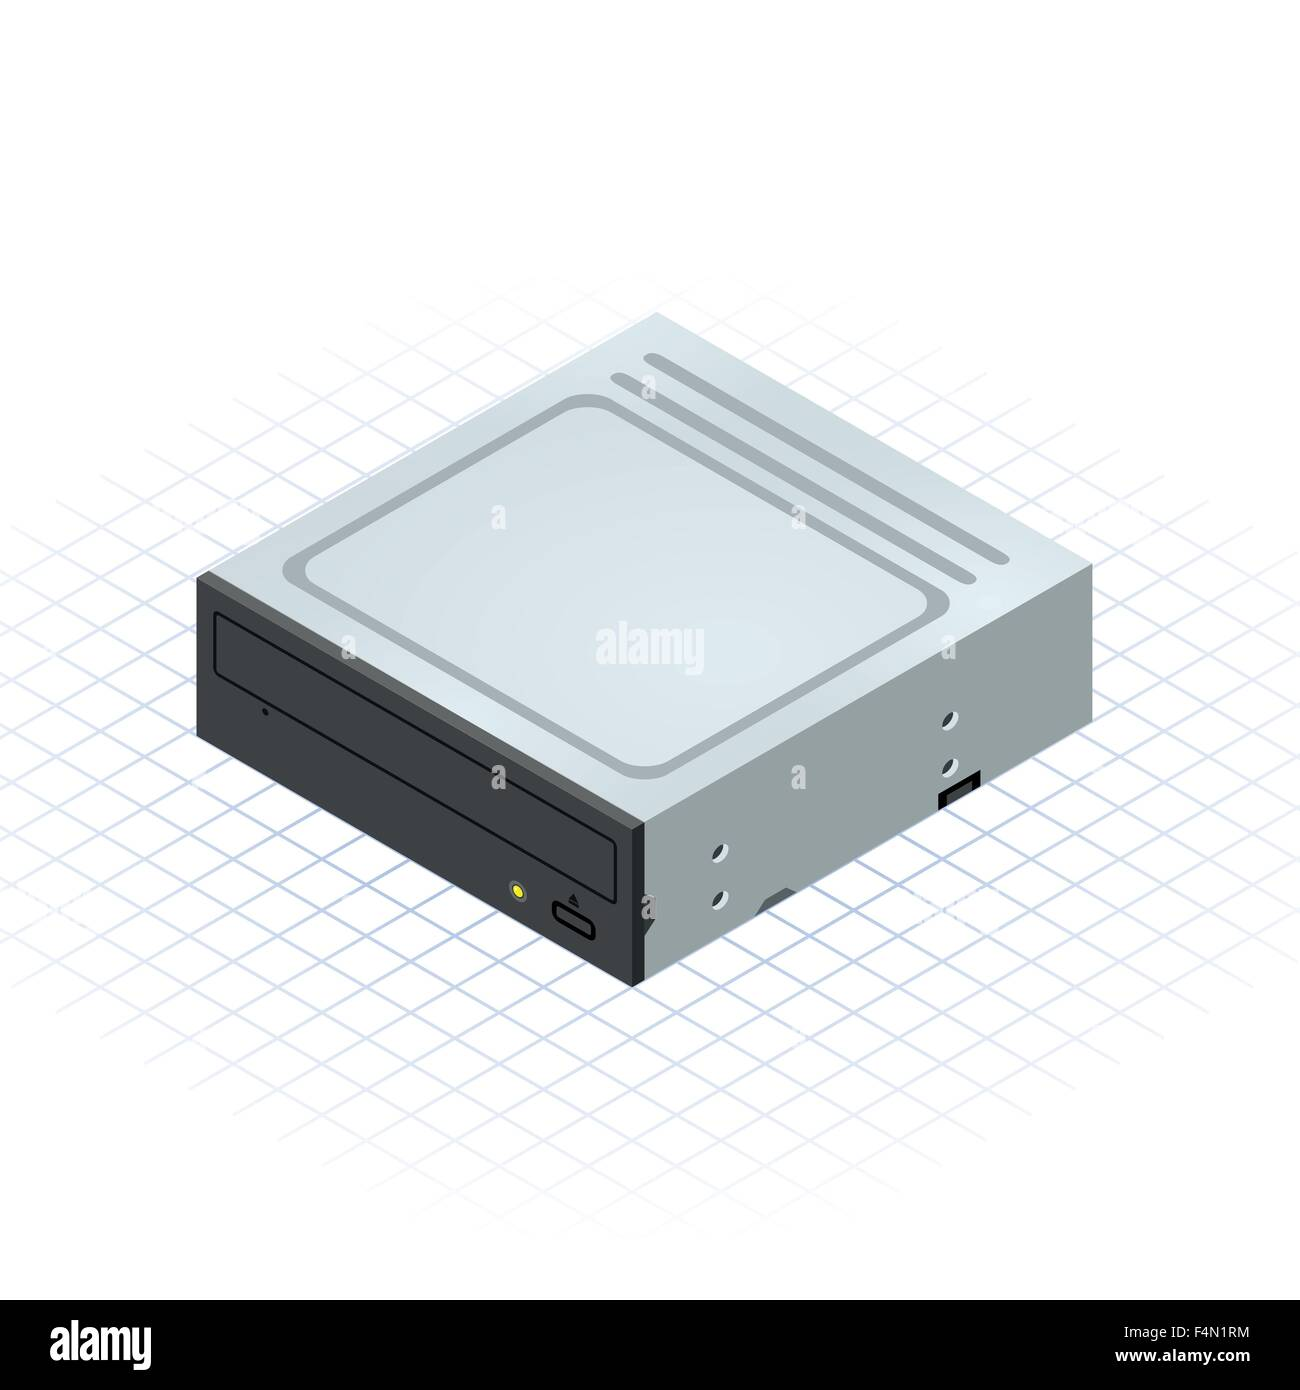 Isometric Disc Drive - Stock Image